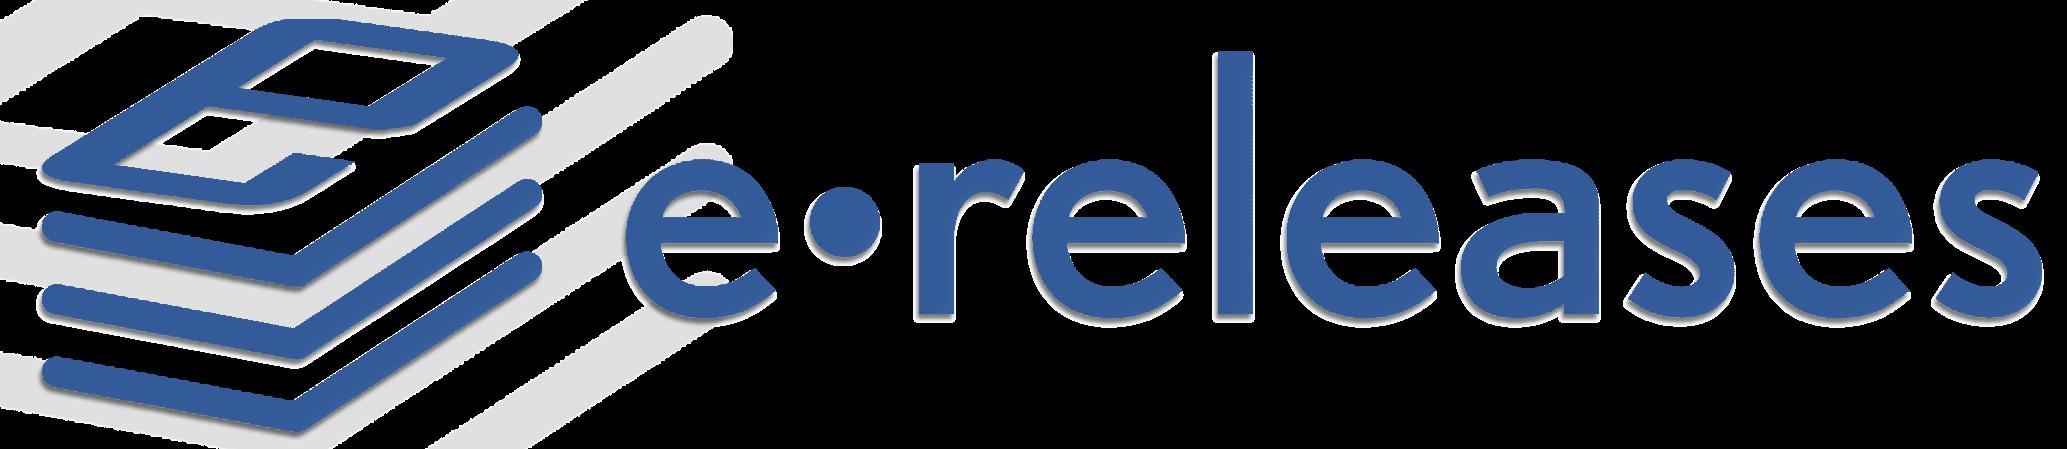 eReleases - press release distribution